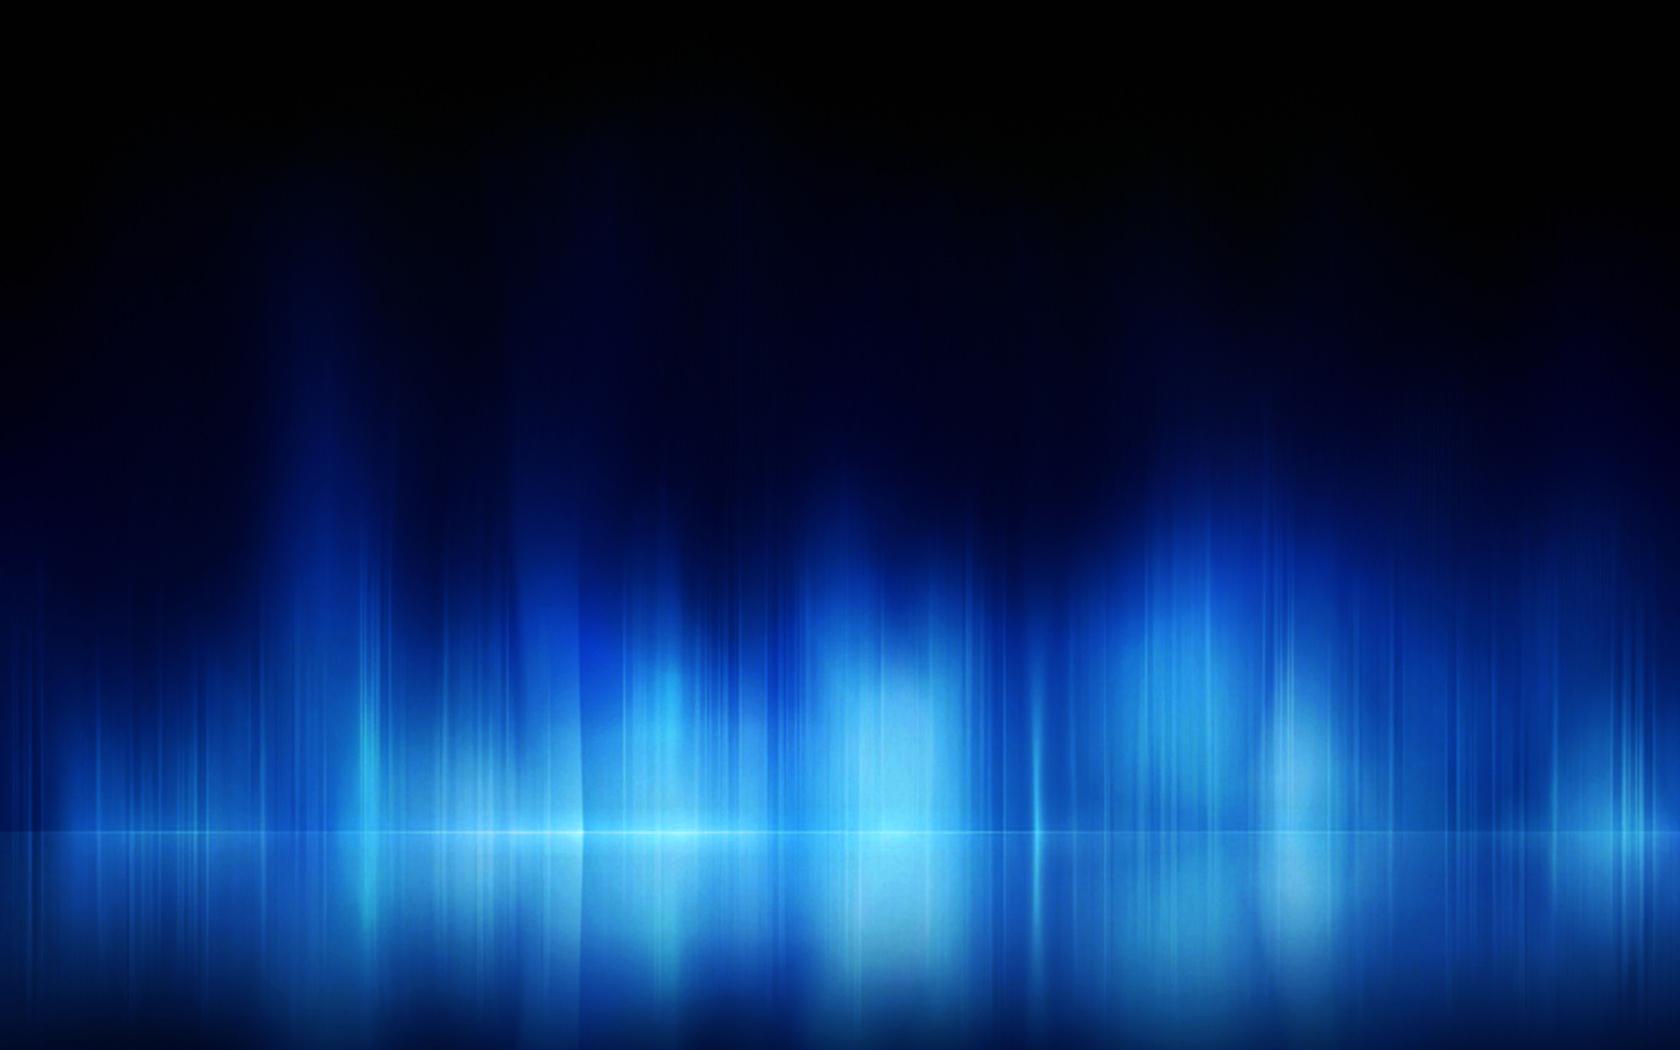 Blue Computer Wallpapers Desktop Backgrounds 1680x1050 ID48076 1680x1050